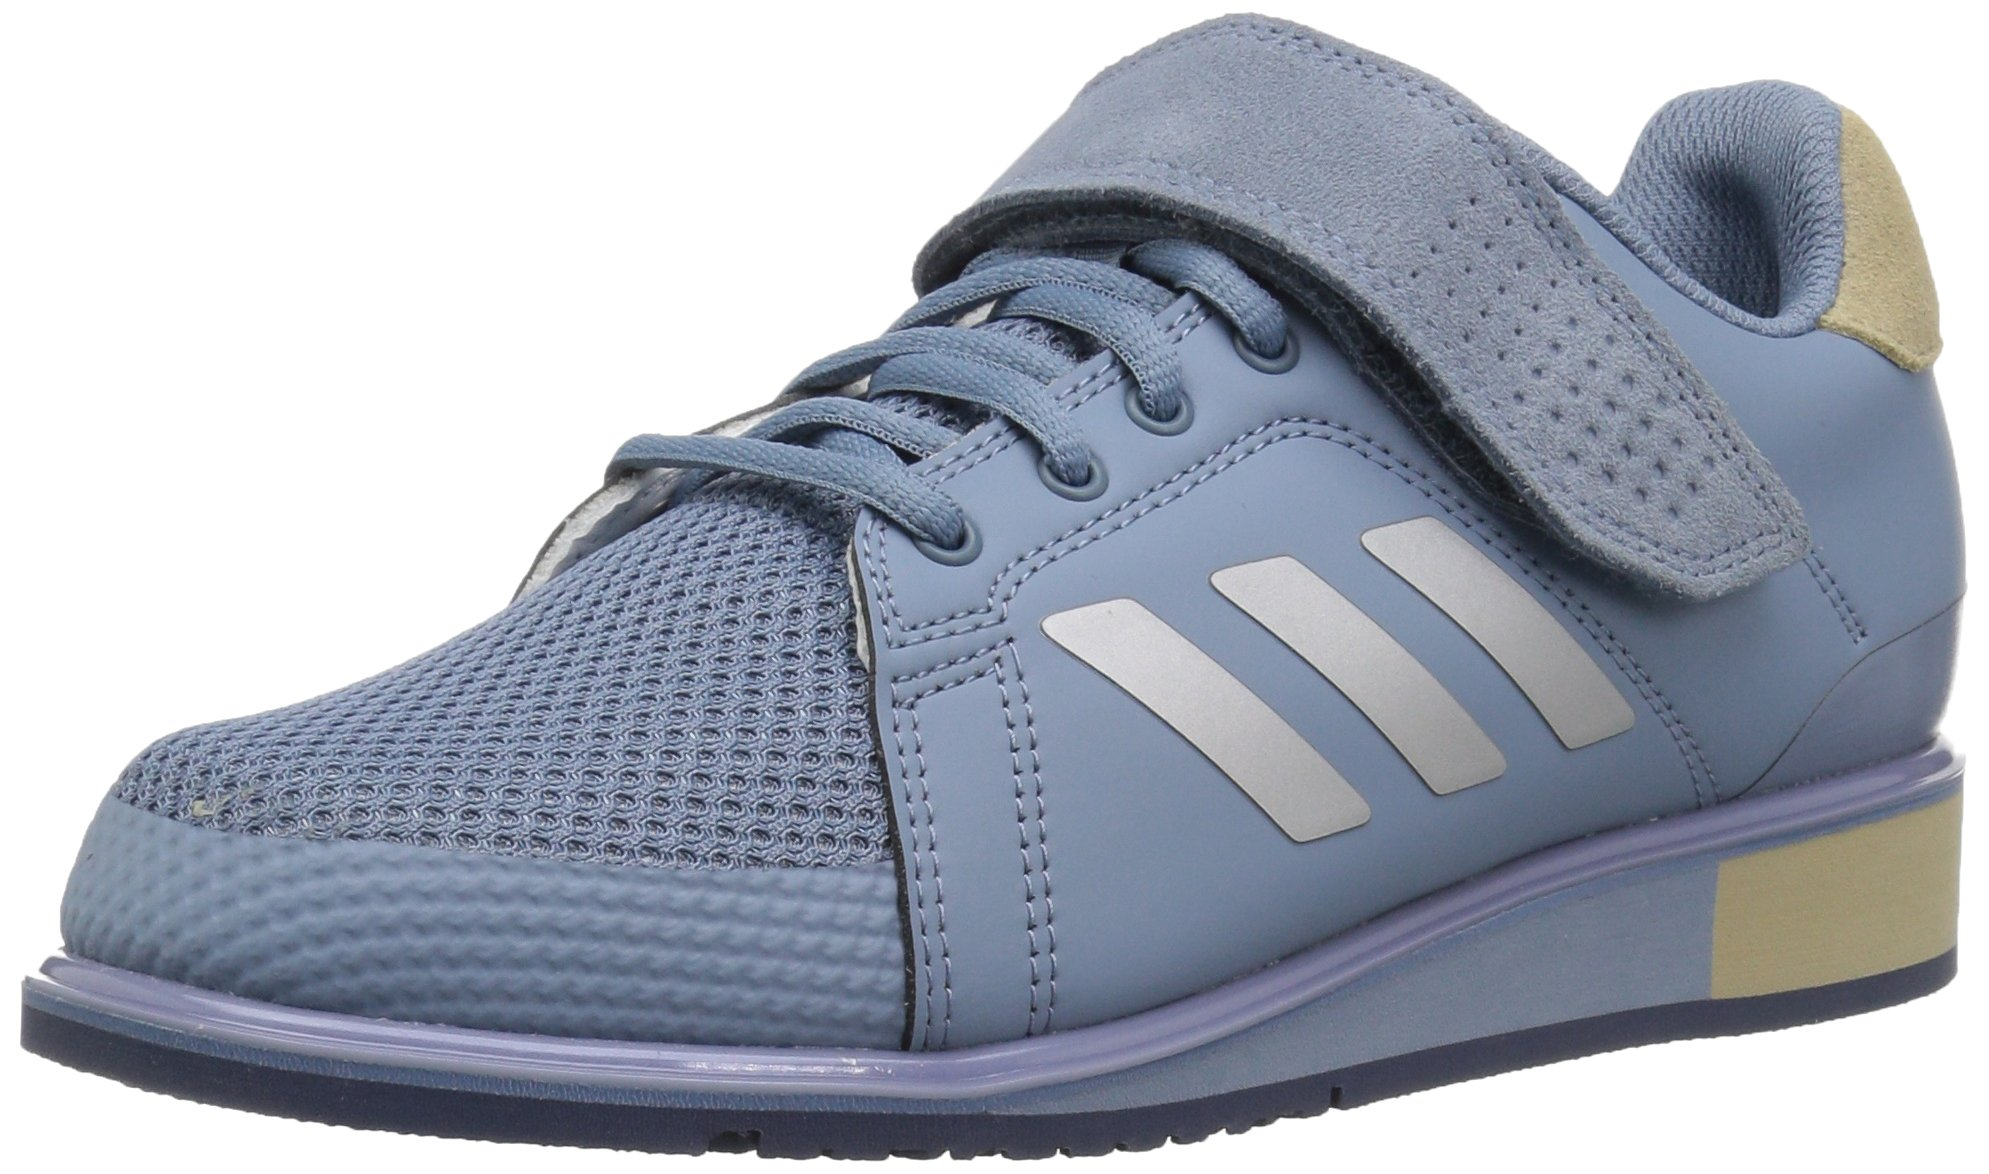 adidas Men's Power Perfect III. Cross Trainer GreyMetallic Silverraw Gold, 4 M US